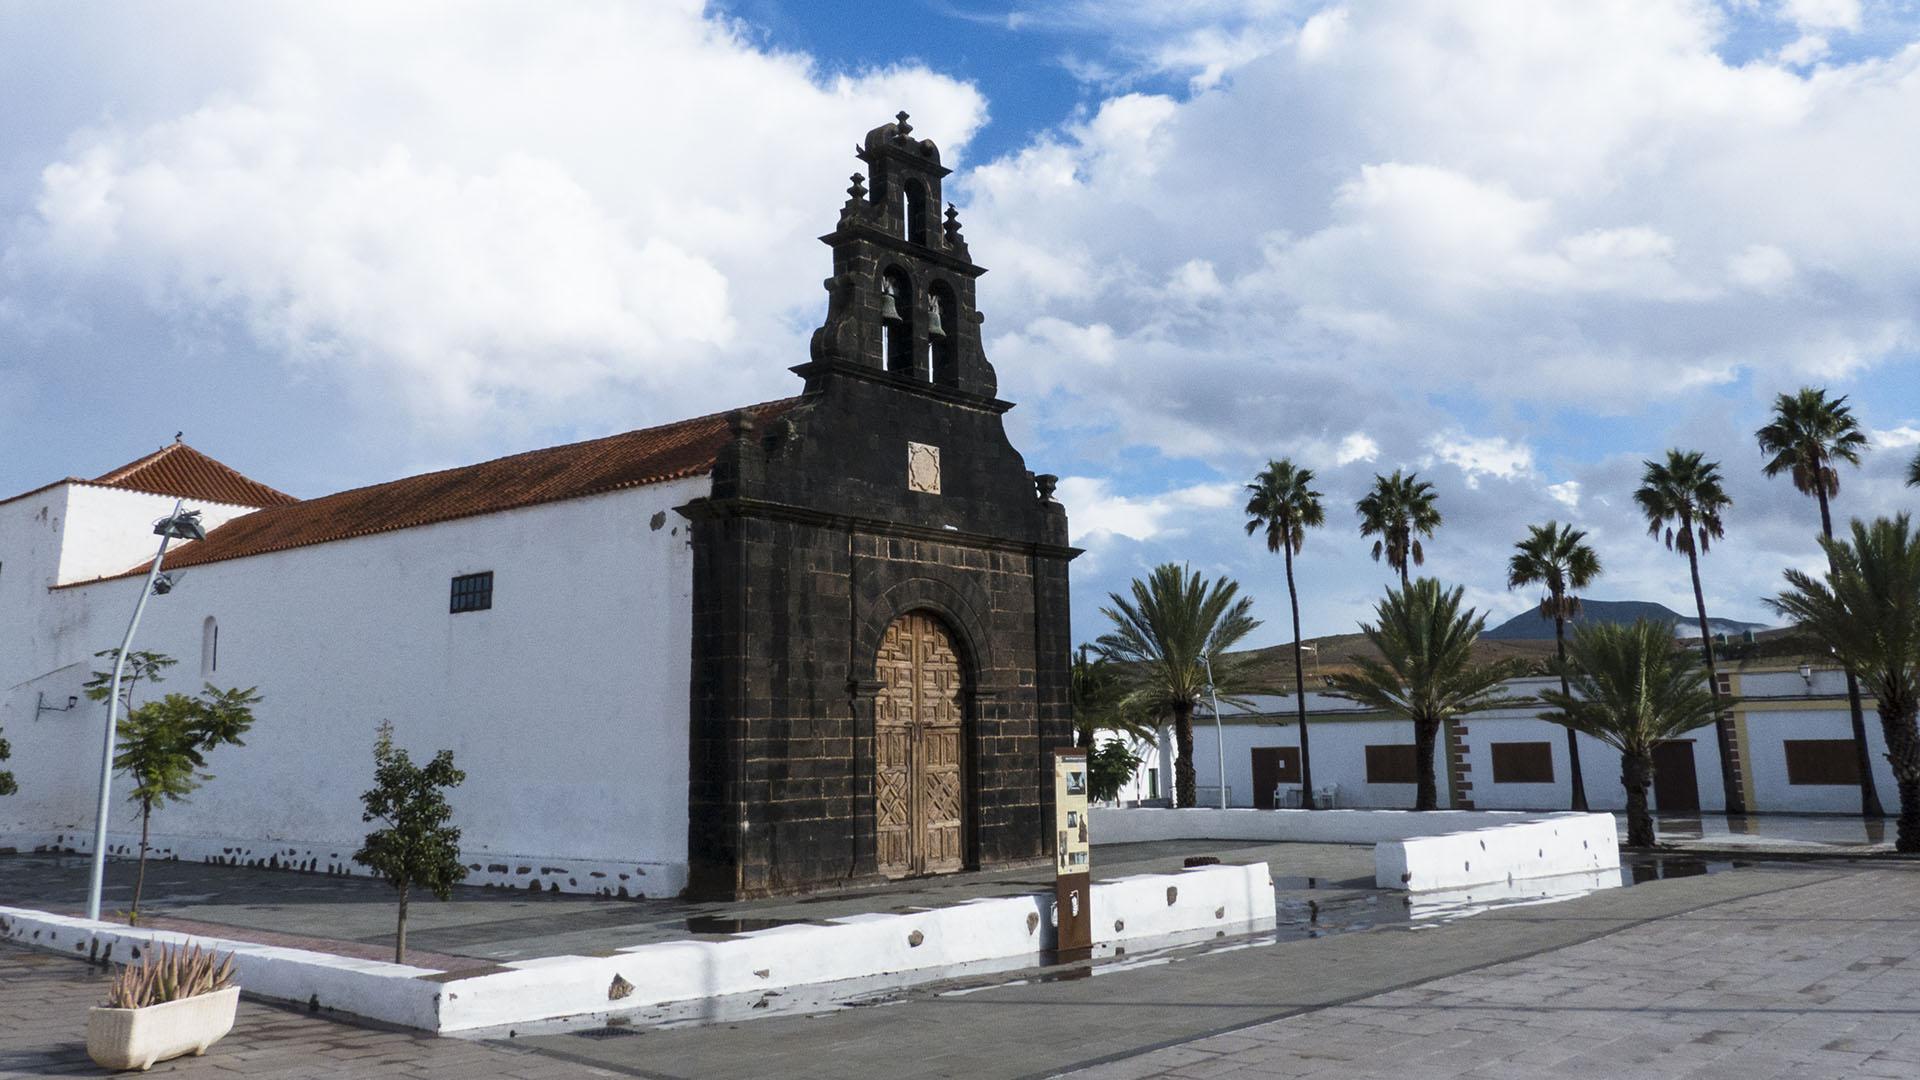 Fuerteventura Inselrundfahrt Norden –Casillas del Angel Fuerteventura Iglesia de Santa Ana.